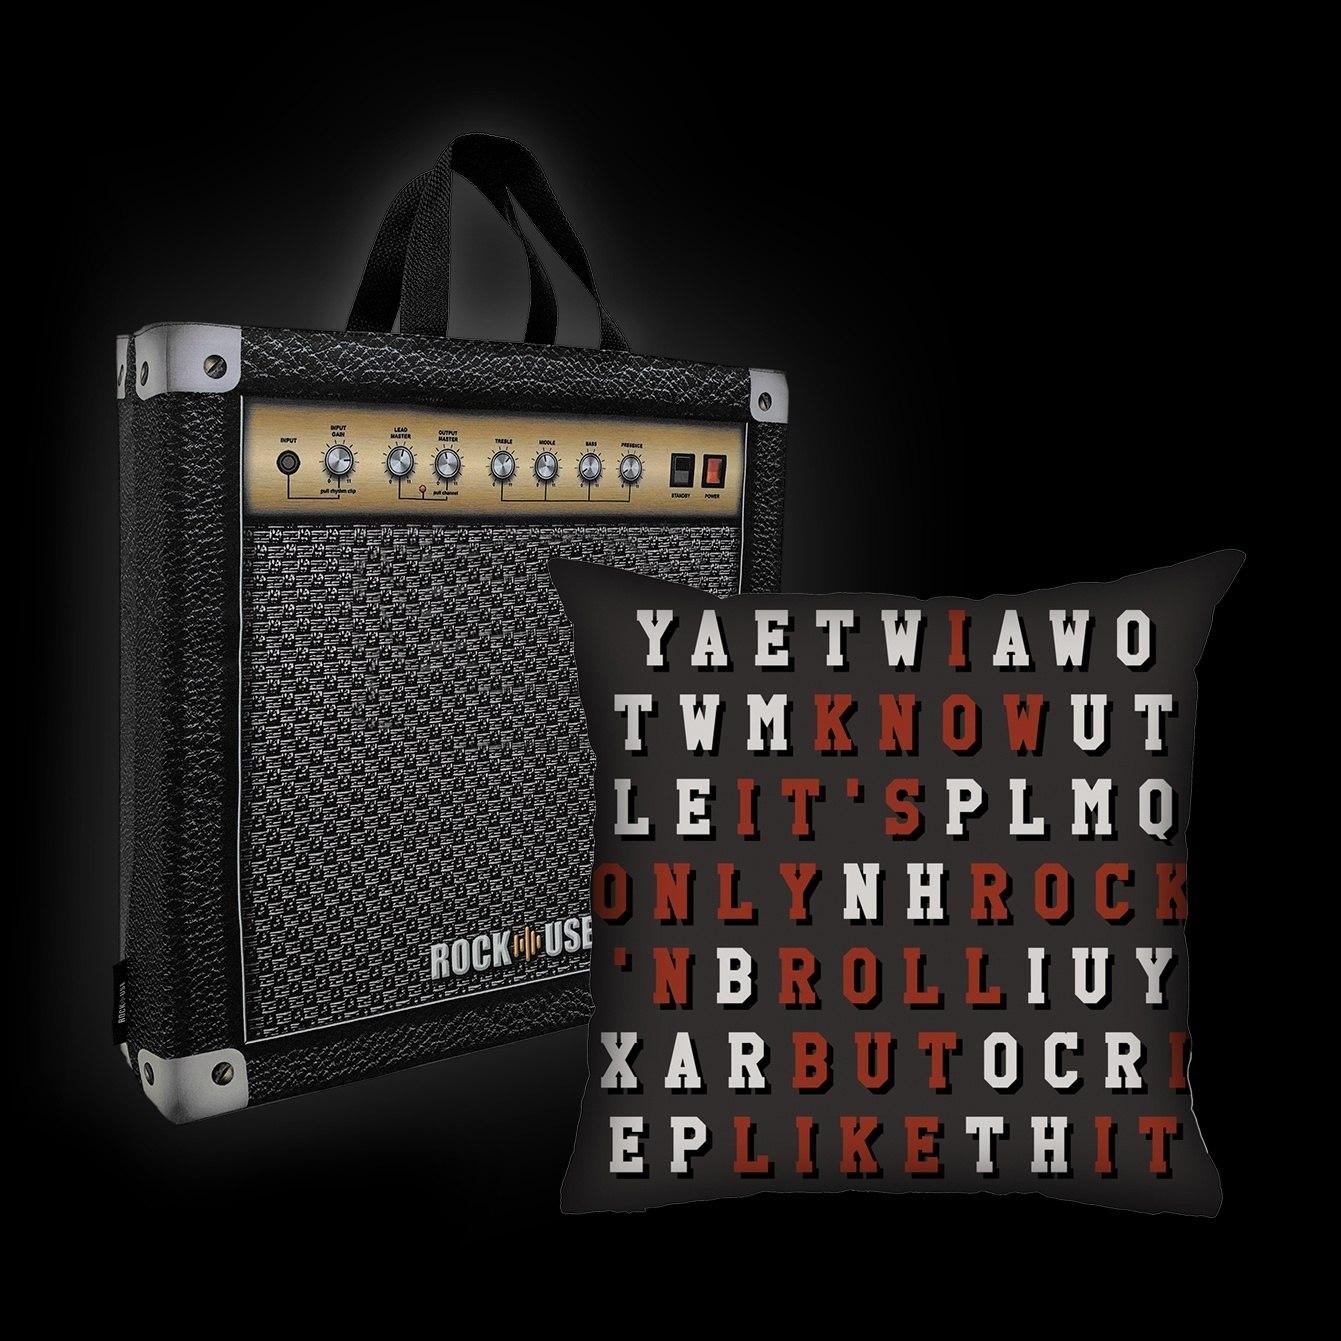 Almofada Bia Lombardi - It's only rock n'roll but I like it!